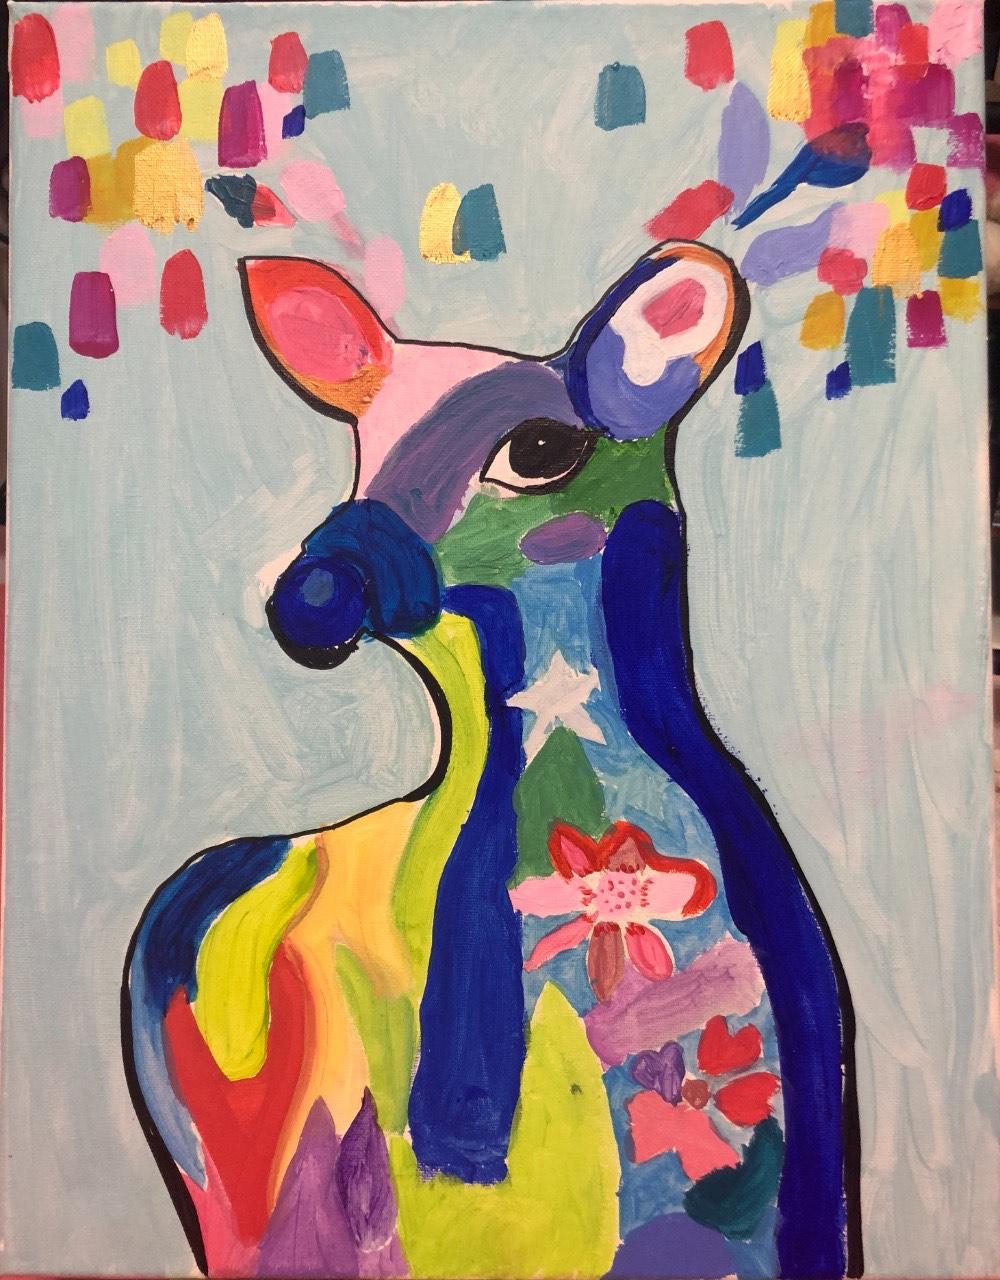 Desert Deer by Nishka Aggarwal